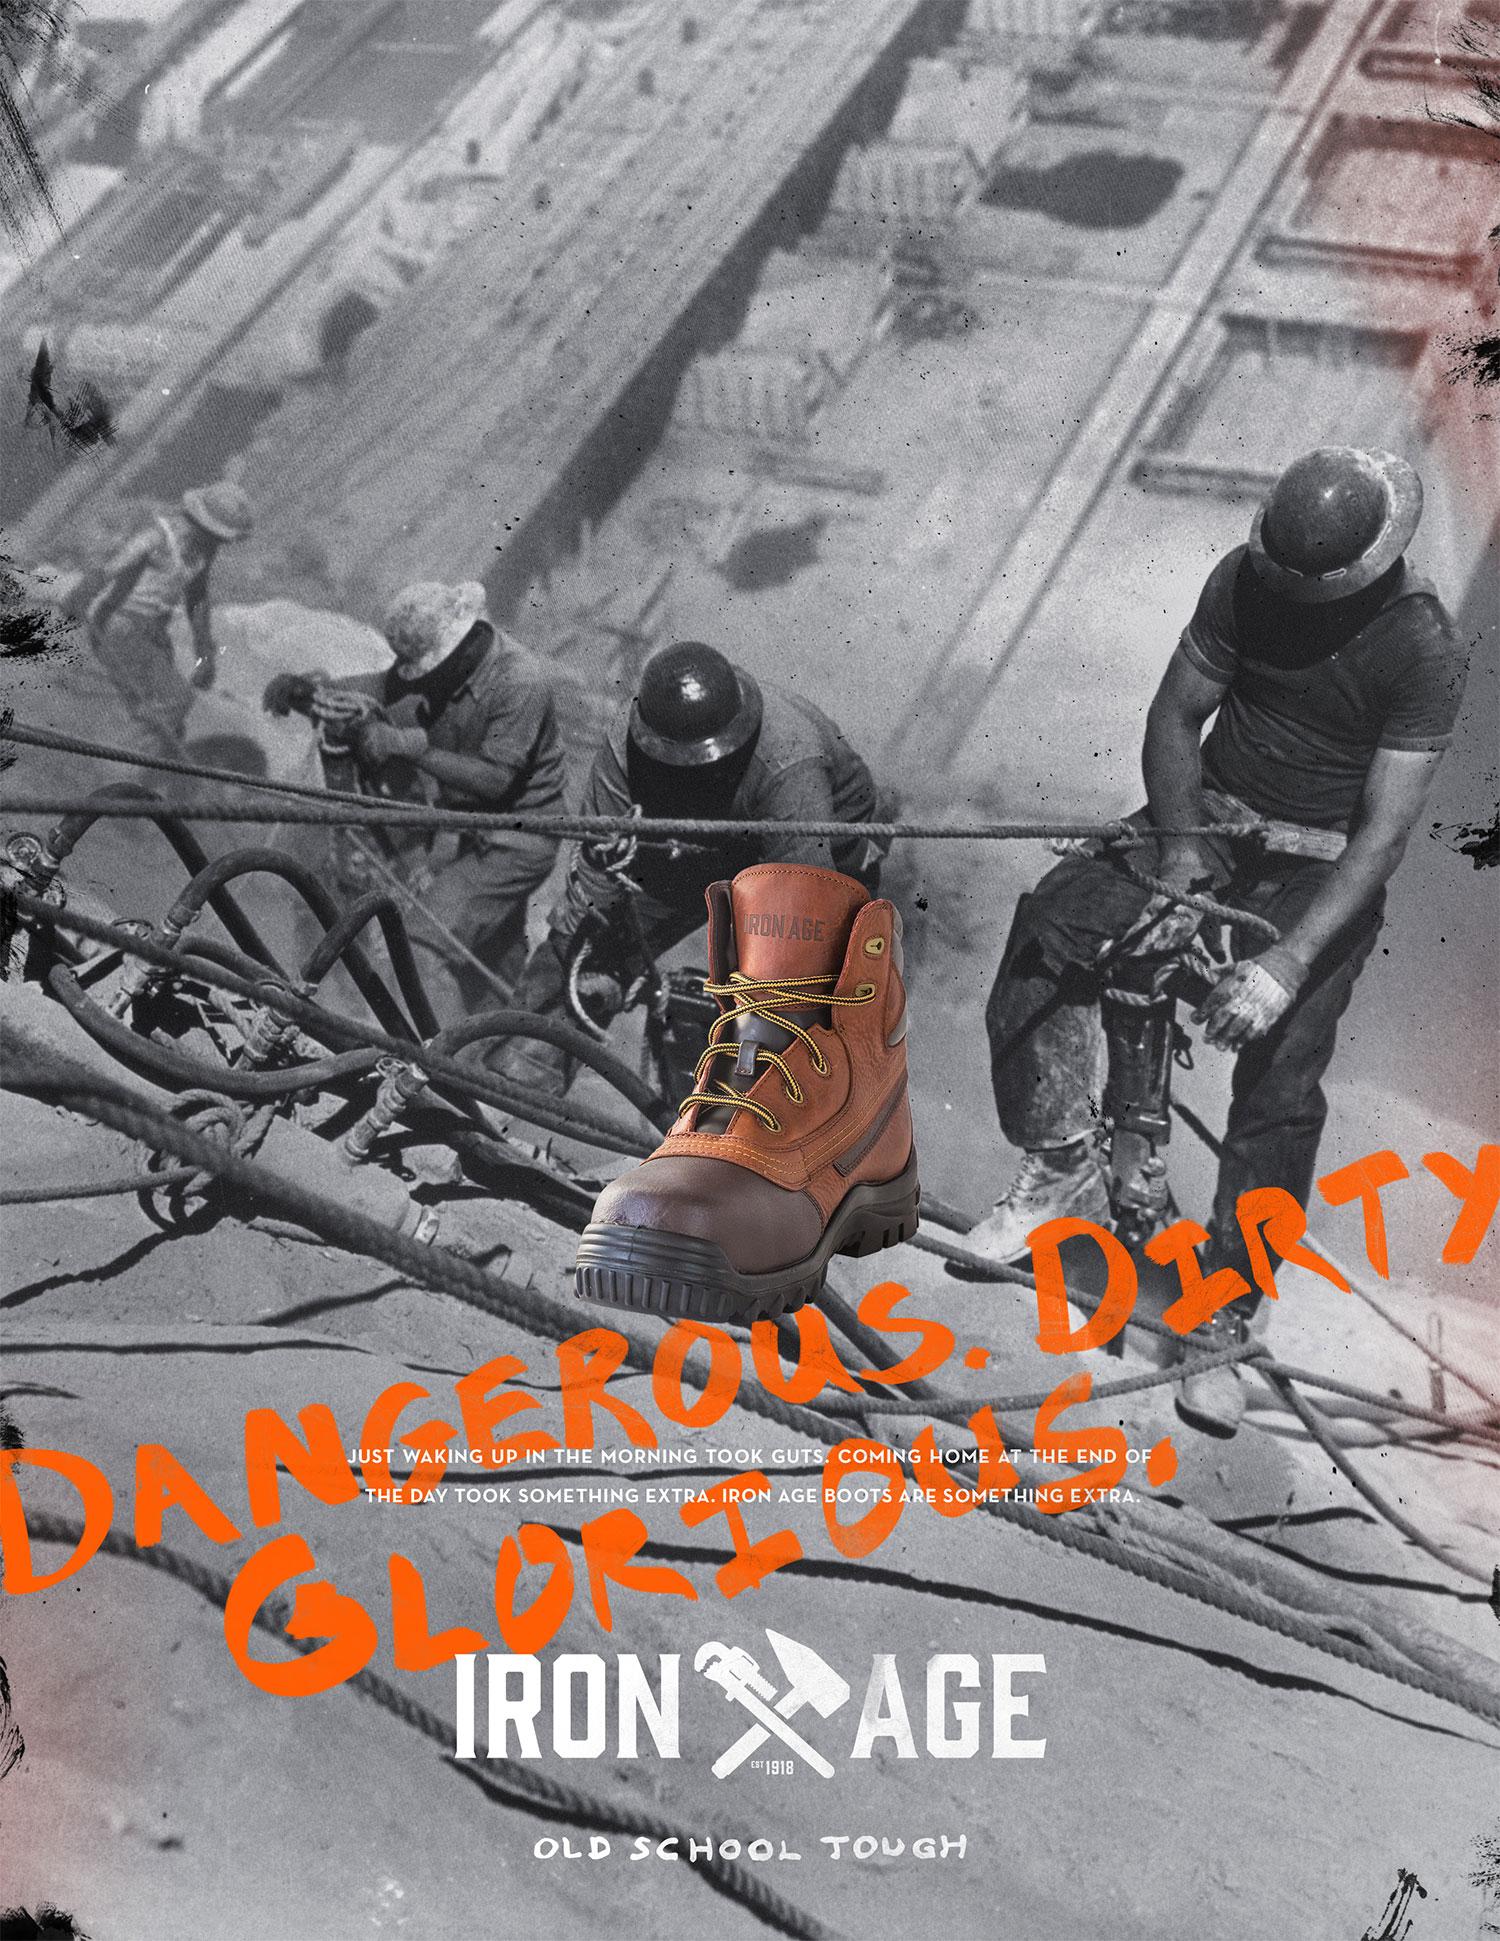 Iron_Age_Print_Ad-2